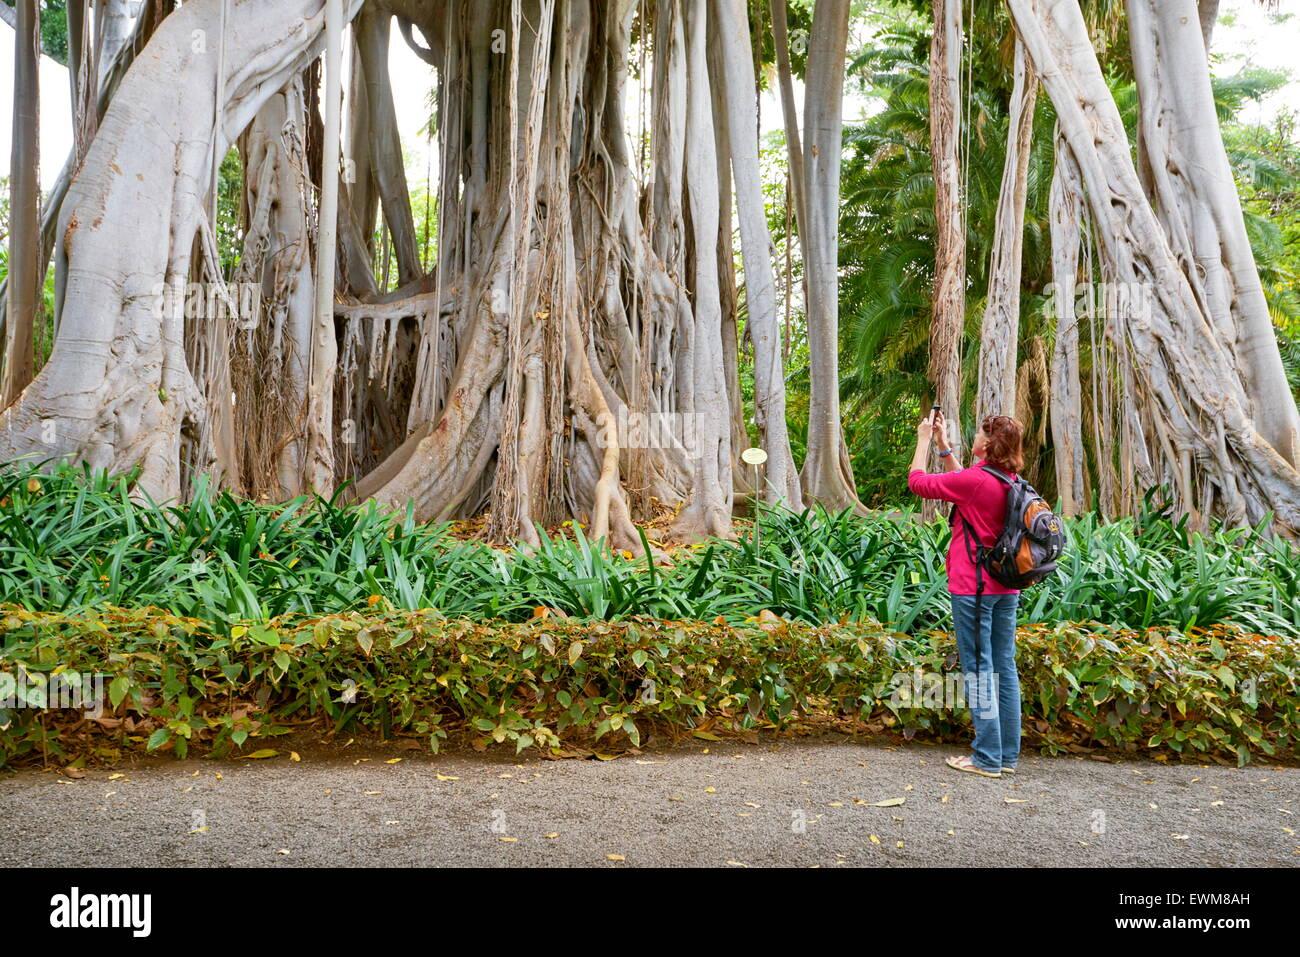 Ficus-Baum, Botanischer Garten, Puerto De La Cruz, Teneriffa, Kanarische Inseln, Spanien Stockbild